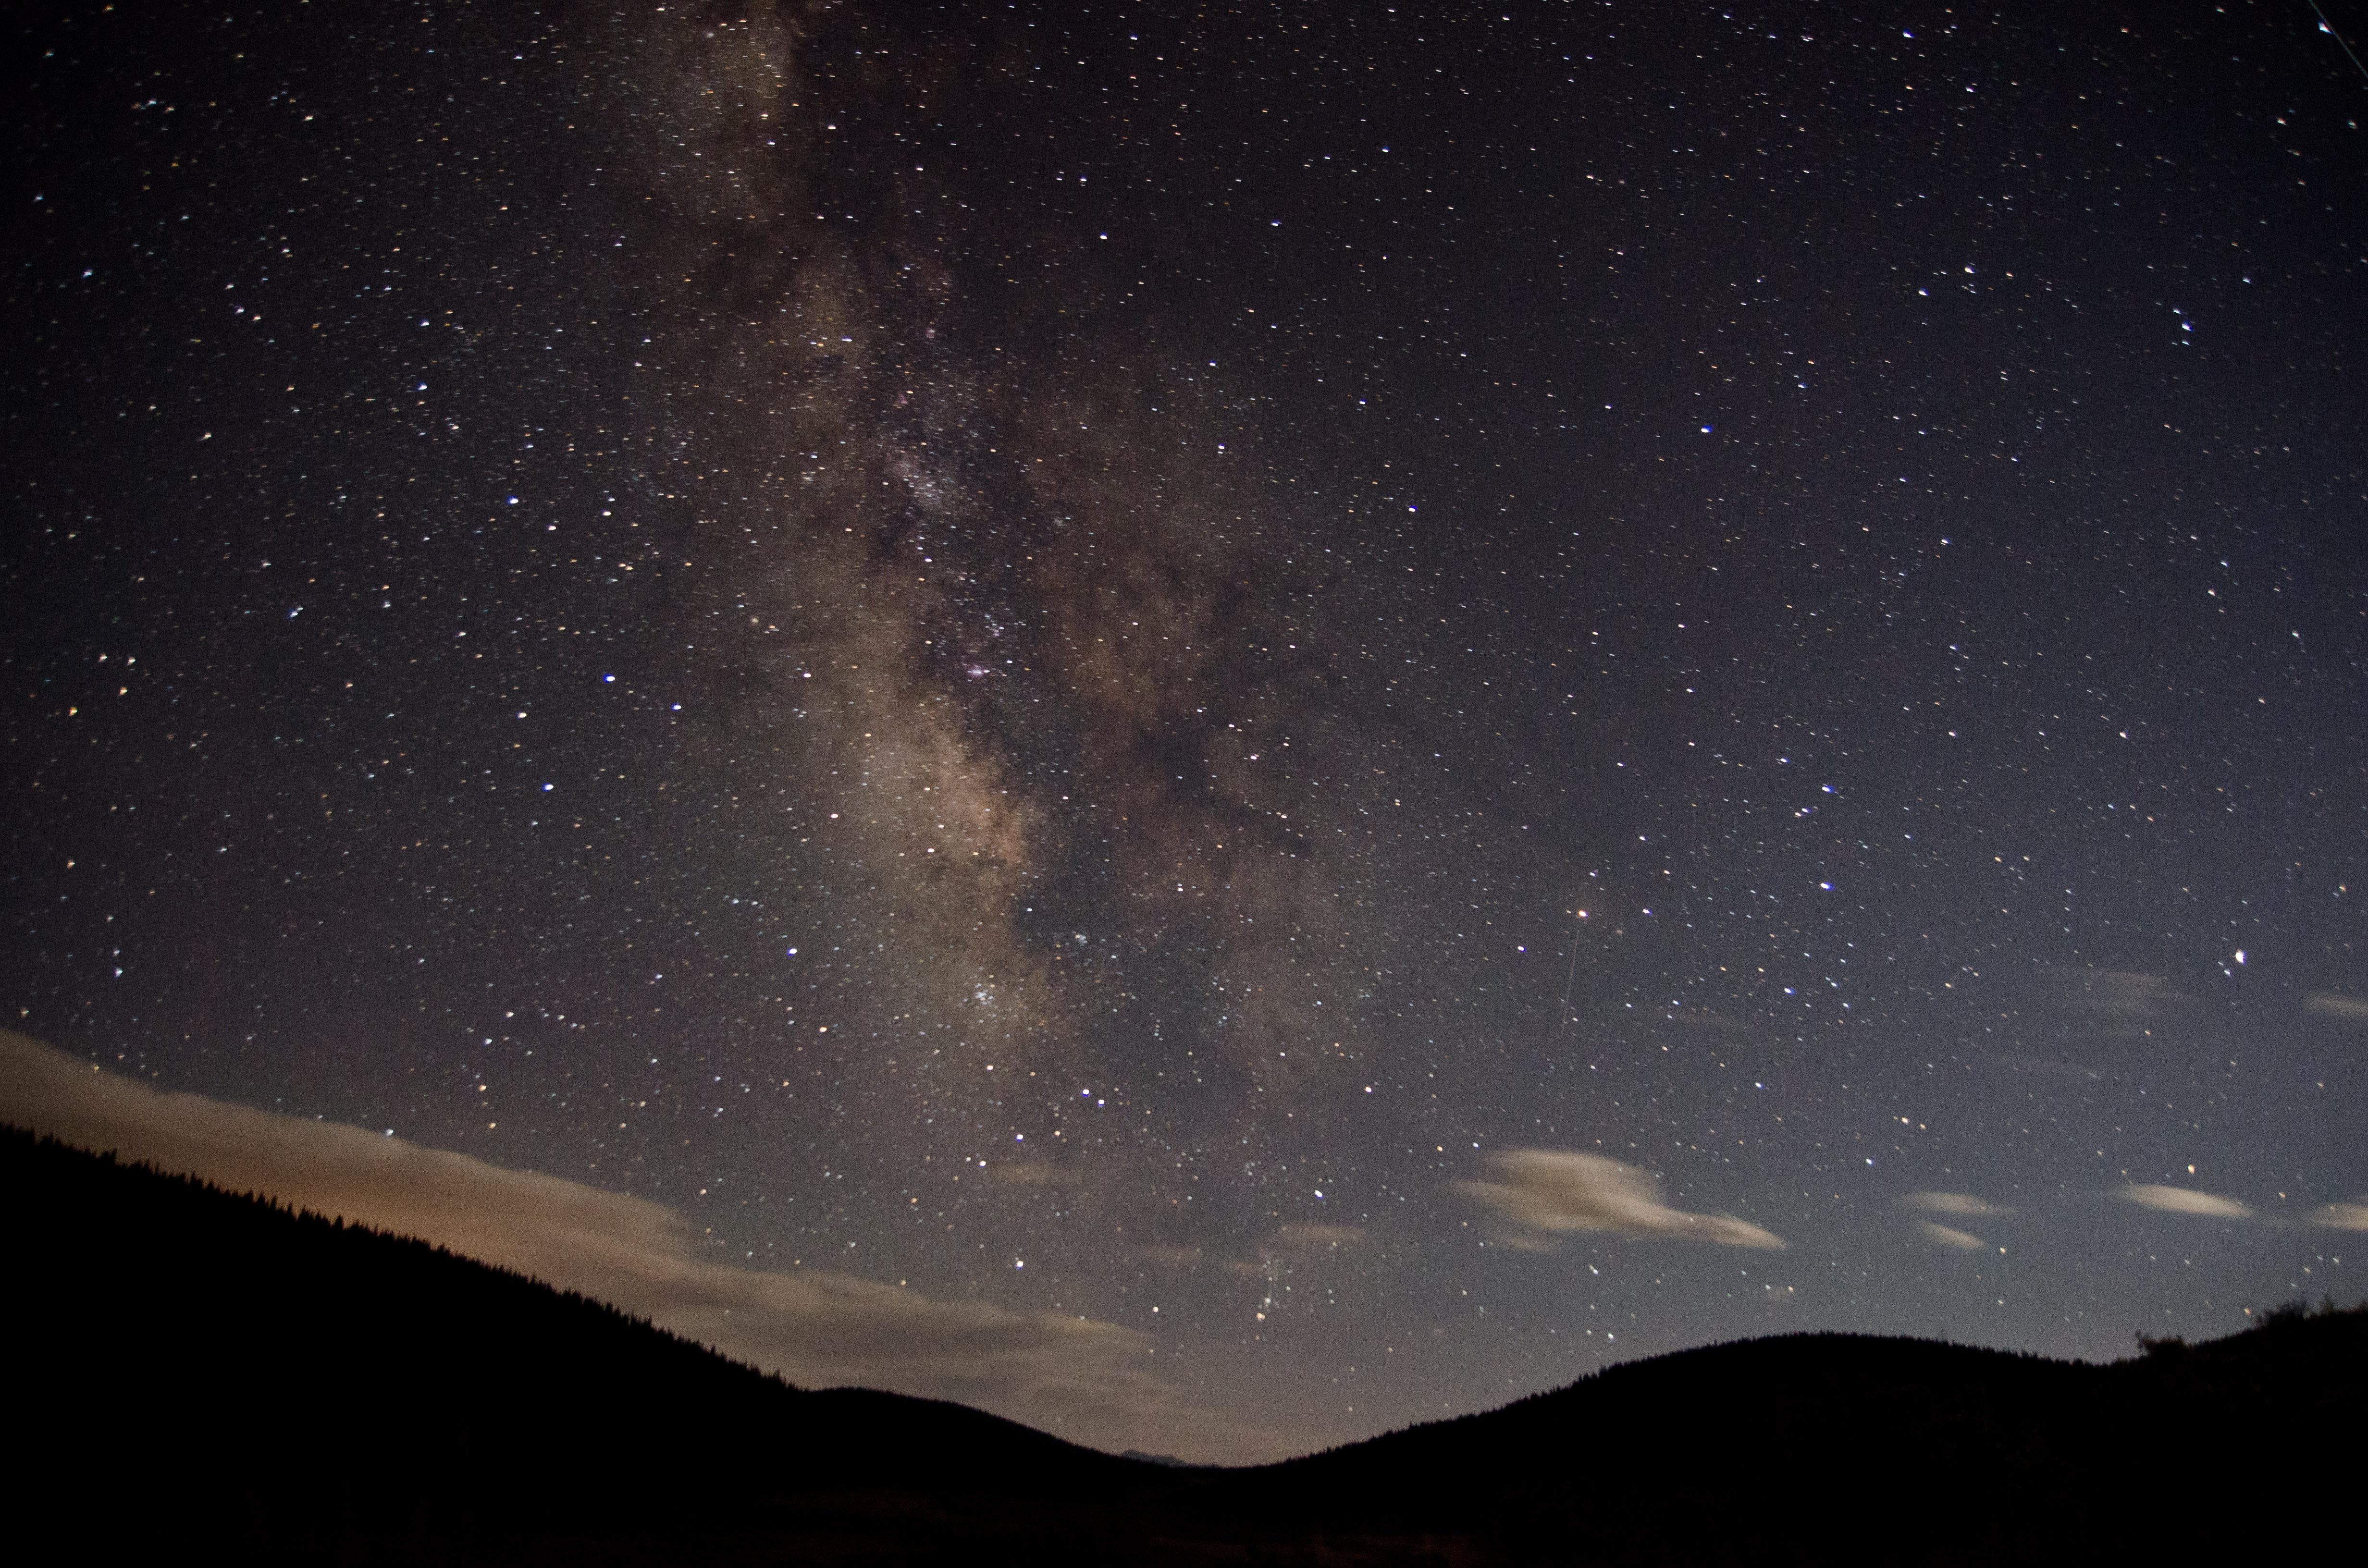 The night sky looking south at Buffalo Peaks Wilderness Area north of Buena Vista, Colorado.